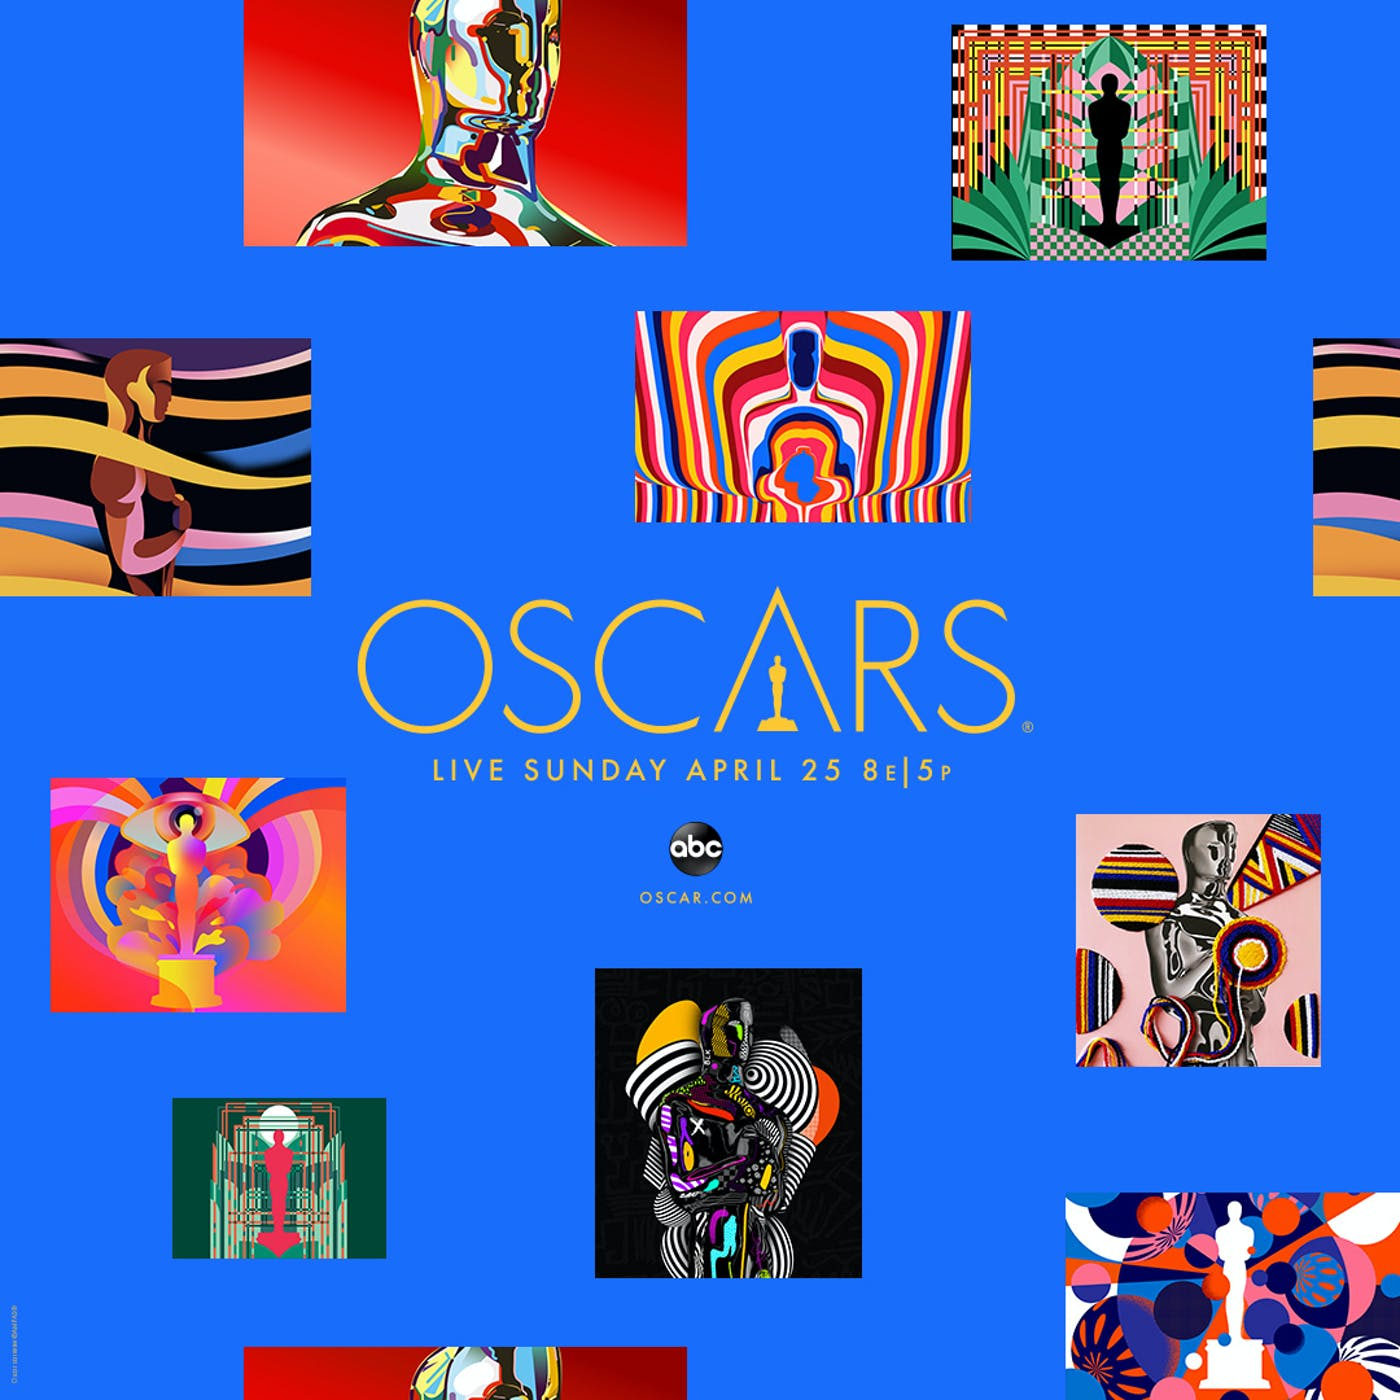 93 Oscars KA Poster Square 1080x1080 Blue